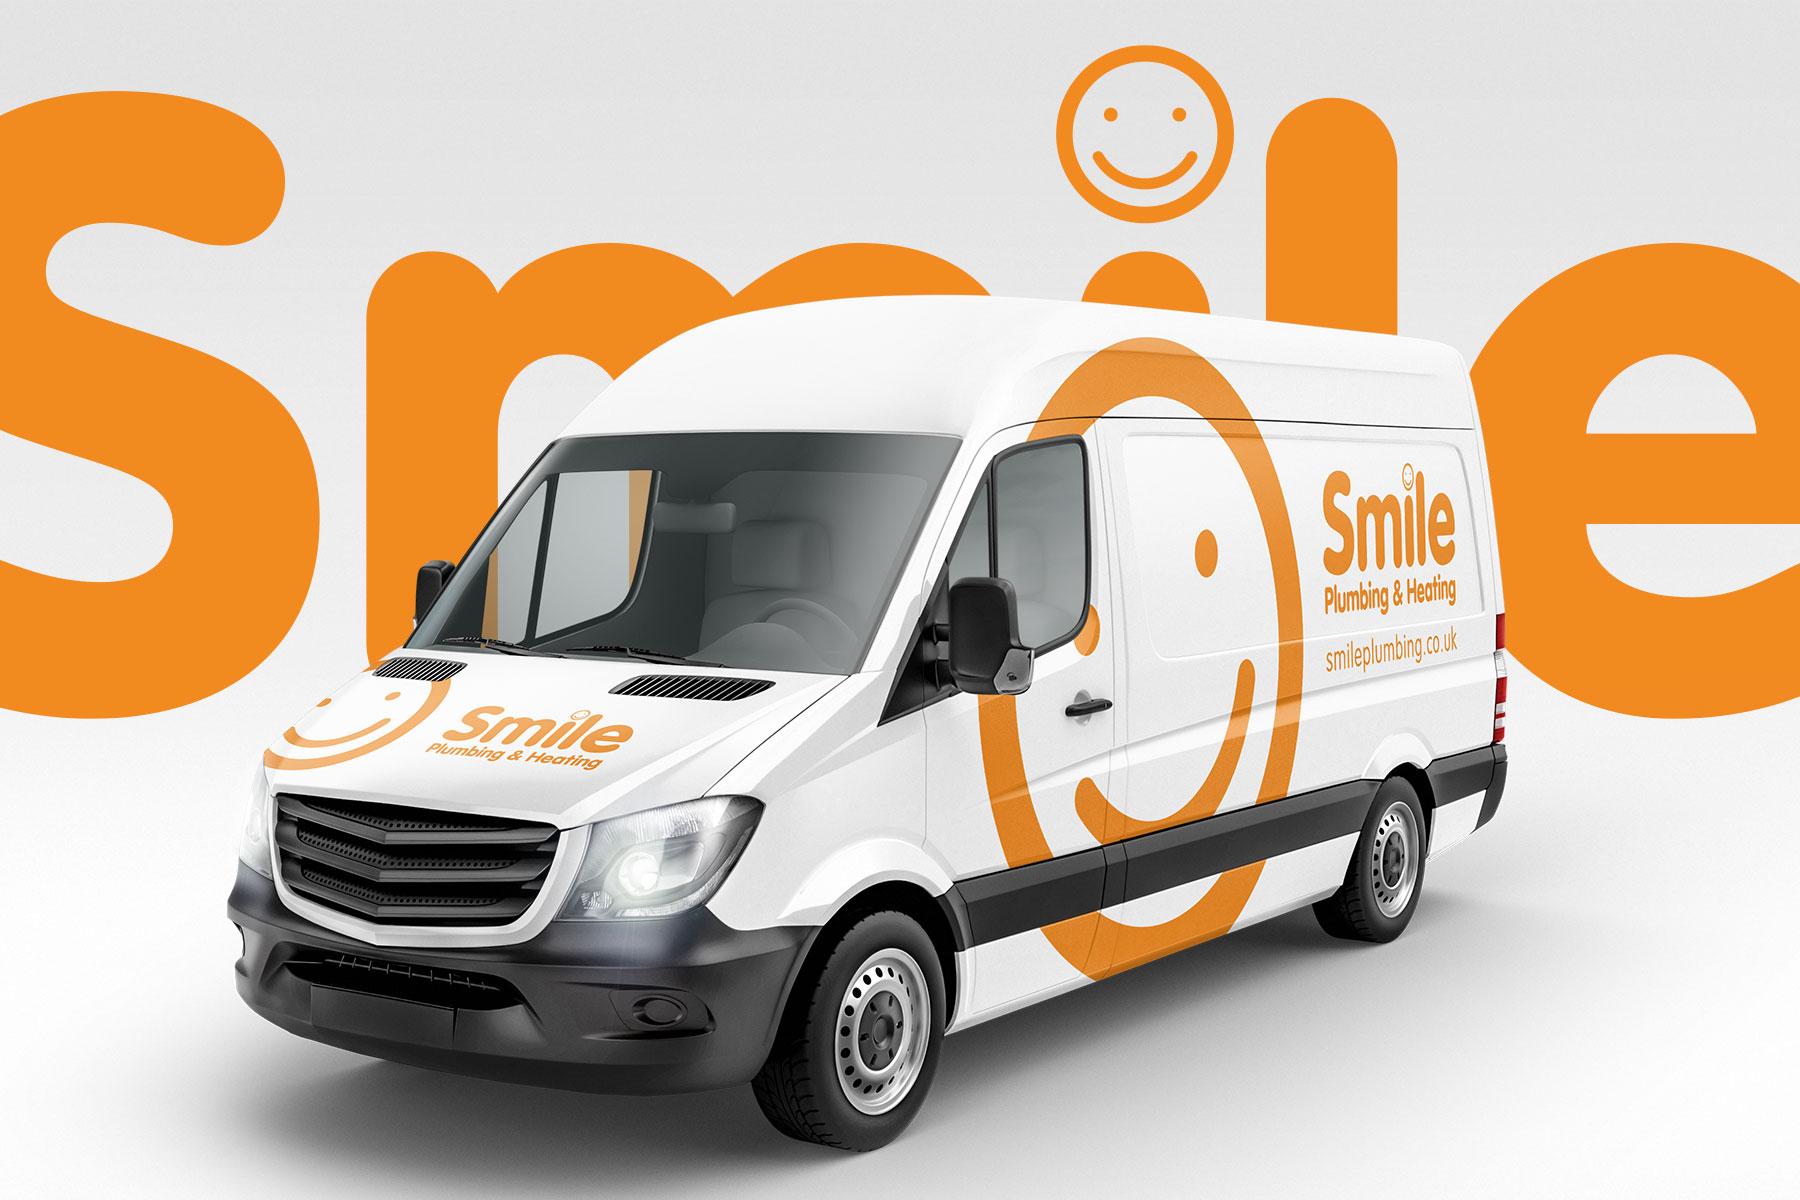 Vehicle graphics for Smile Plumbing branding